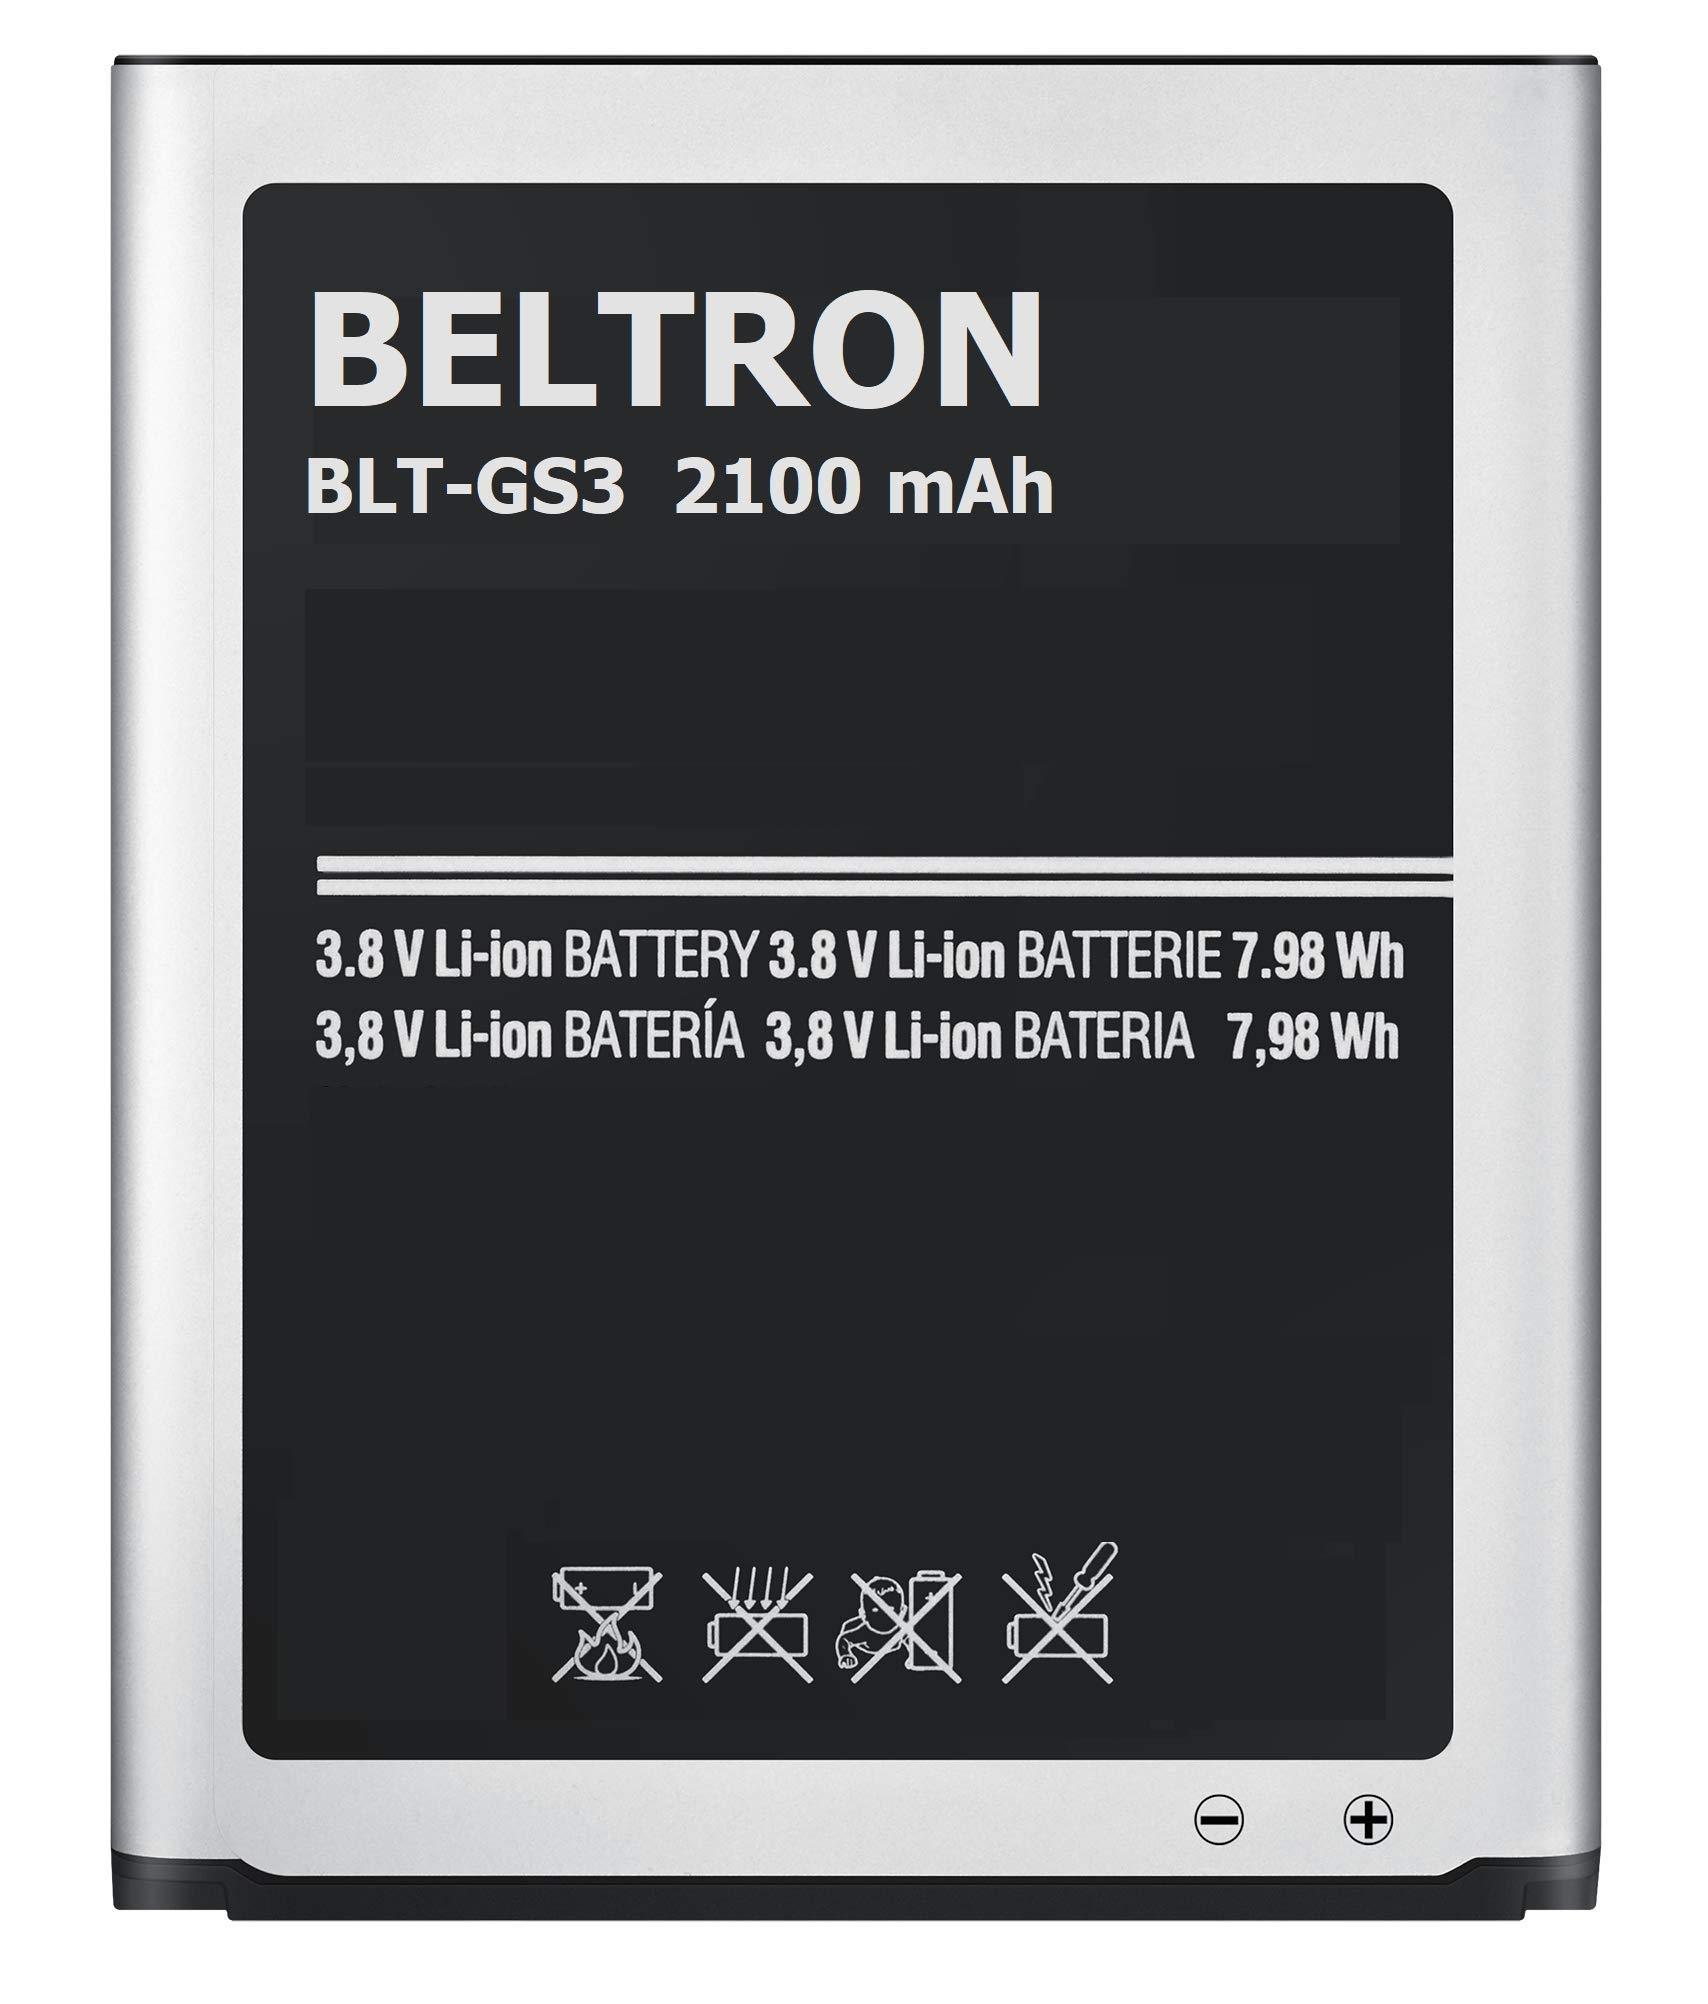 Bateria BELTRON 2100 mAh para Samsung Galaxy S3 SIII I747 I535 L710 T999 EB L1G6LLA EB L1G6LLU EB L1G6LLZ